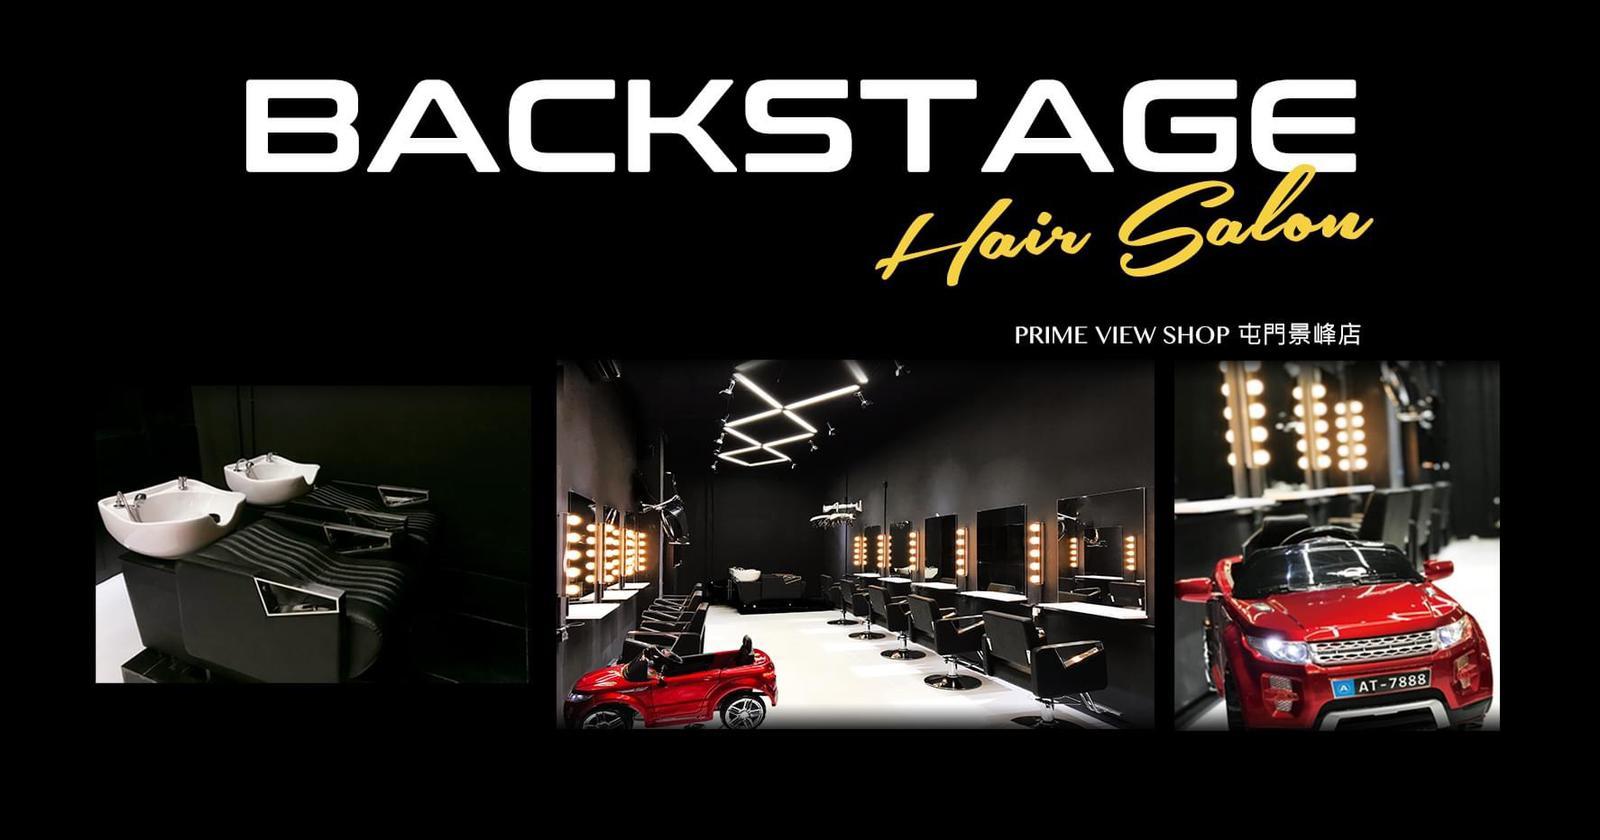 Hayes@Backstage Hair